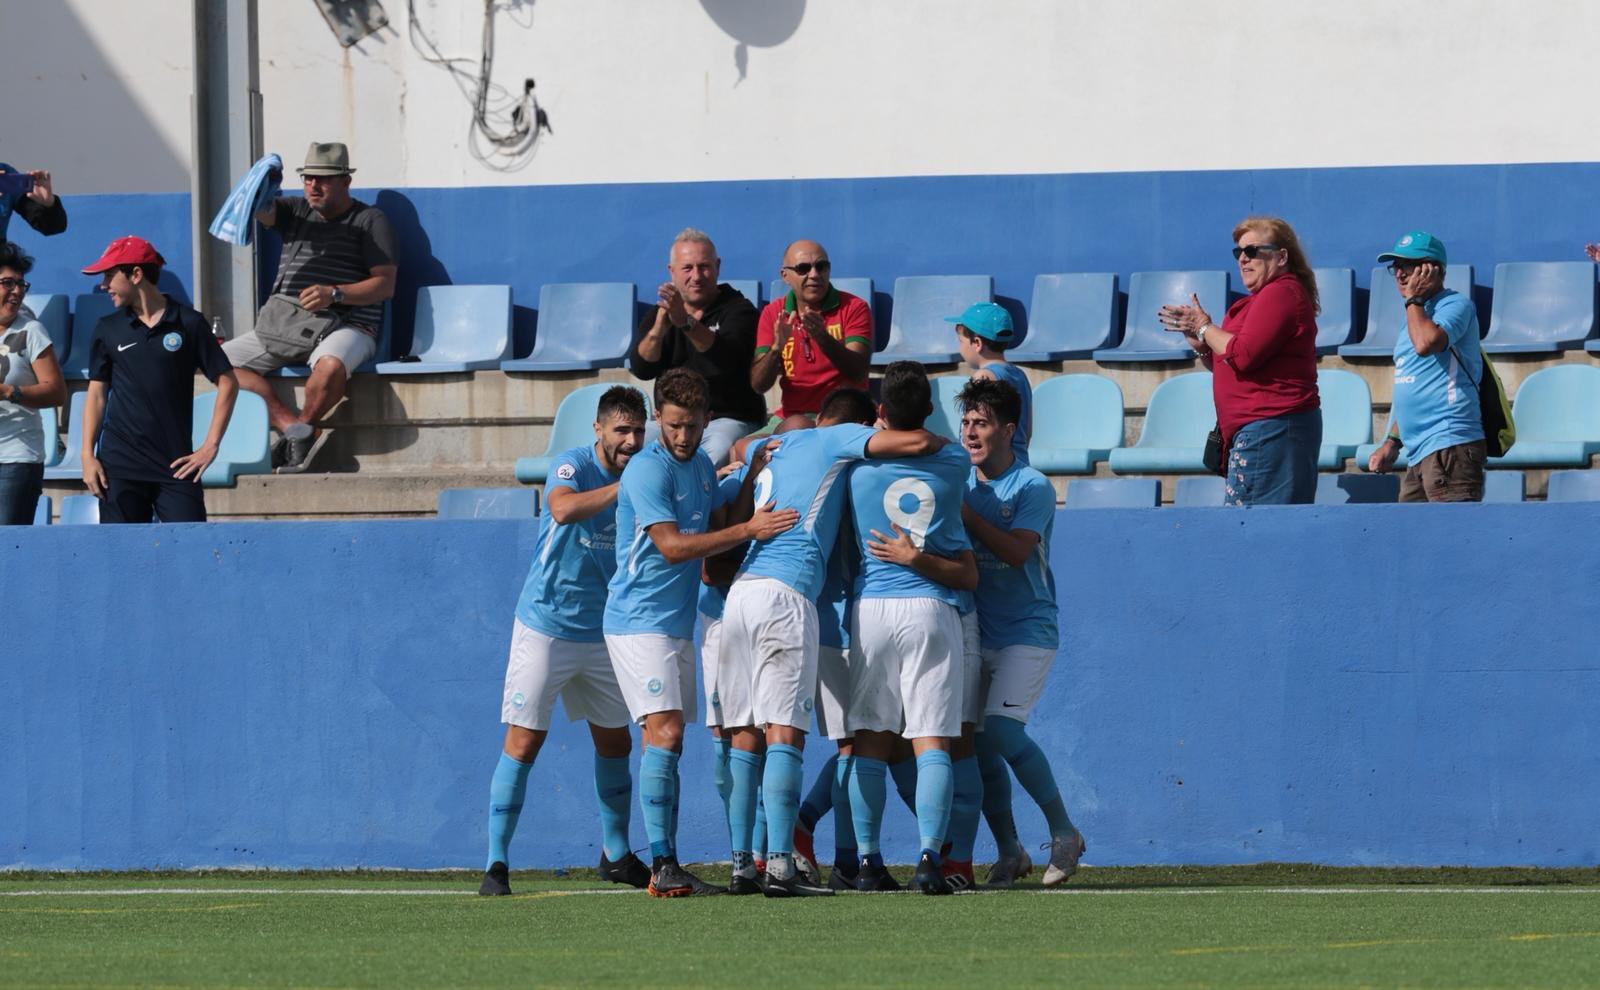 Crónica 2ª División B: UD Ibiza-Eivissa 4-0 Marbella FC - Segunda B ...